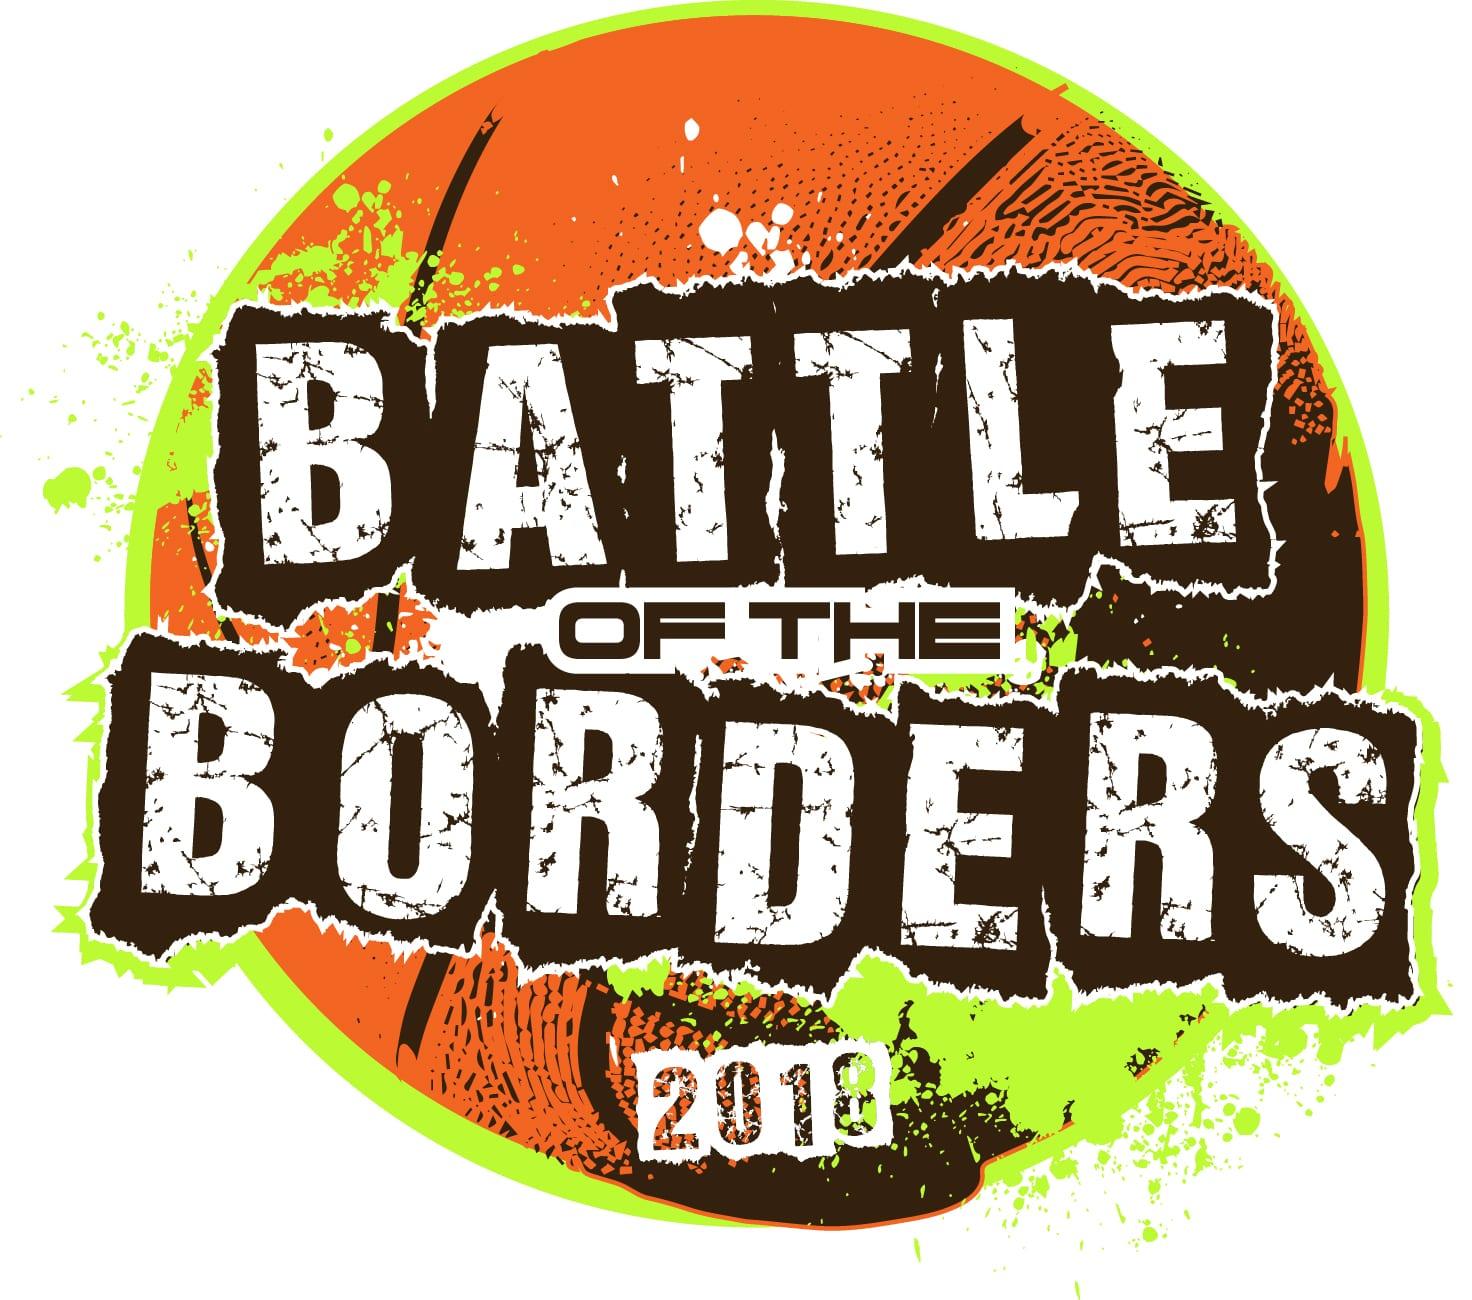 Battle of the borders basketball 2018 adjustable t-shirt logo design